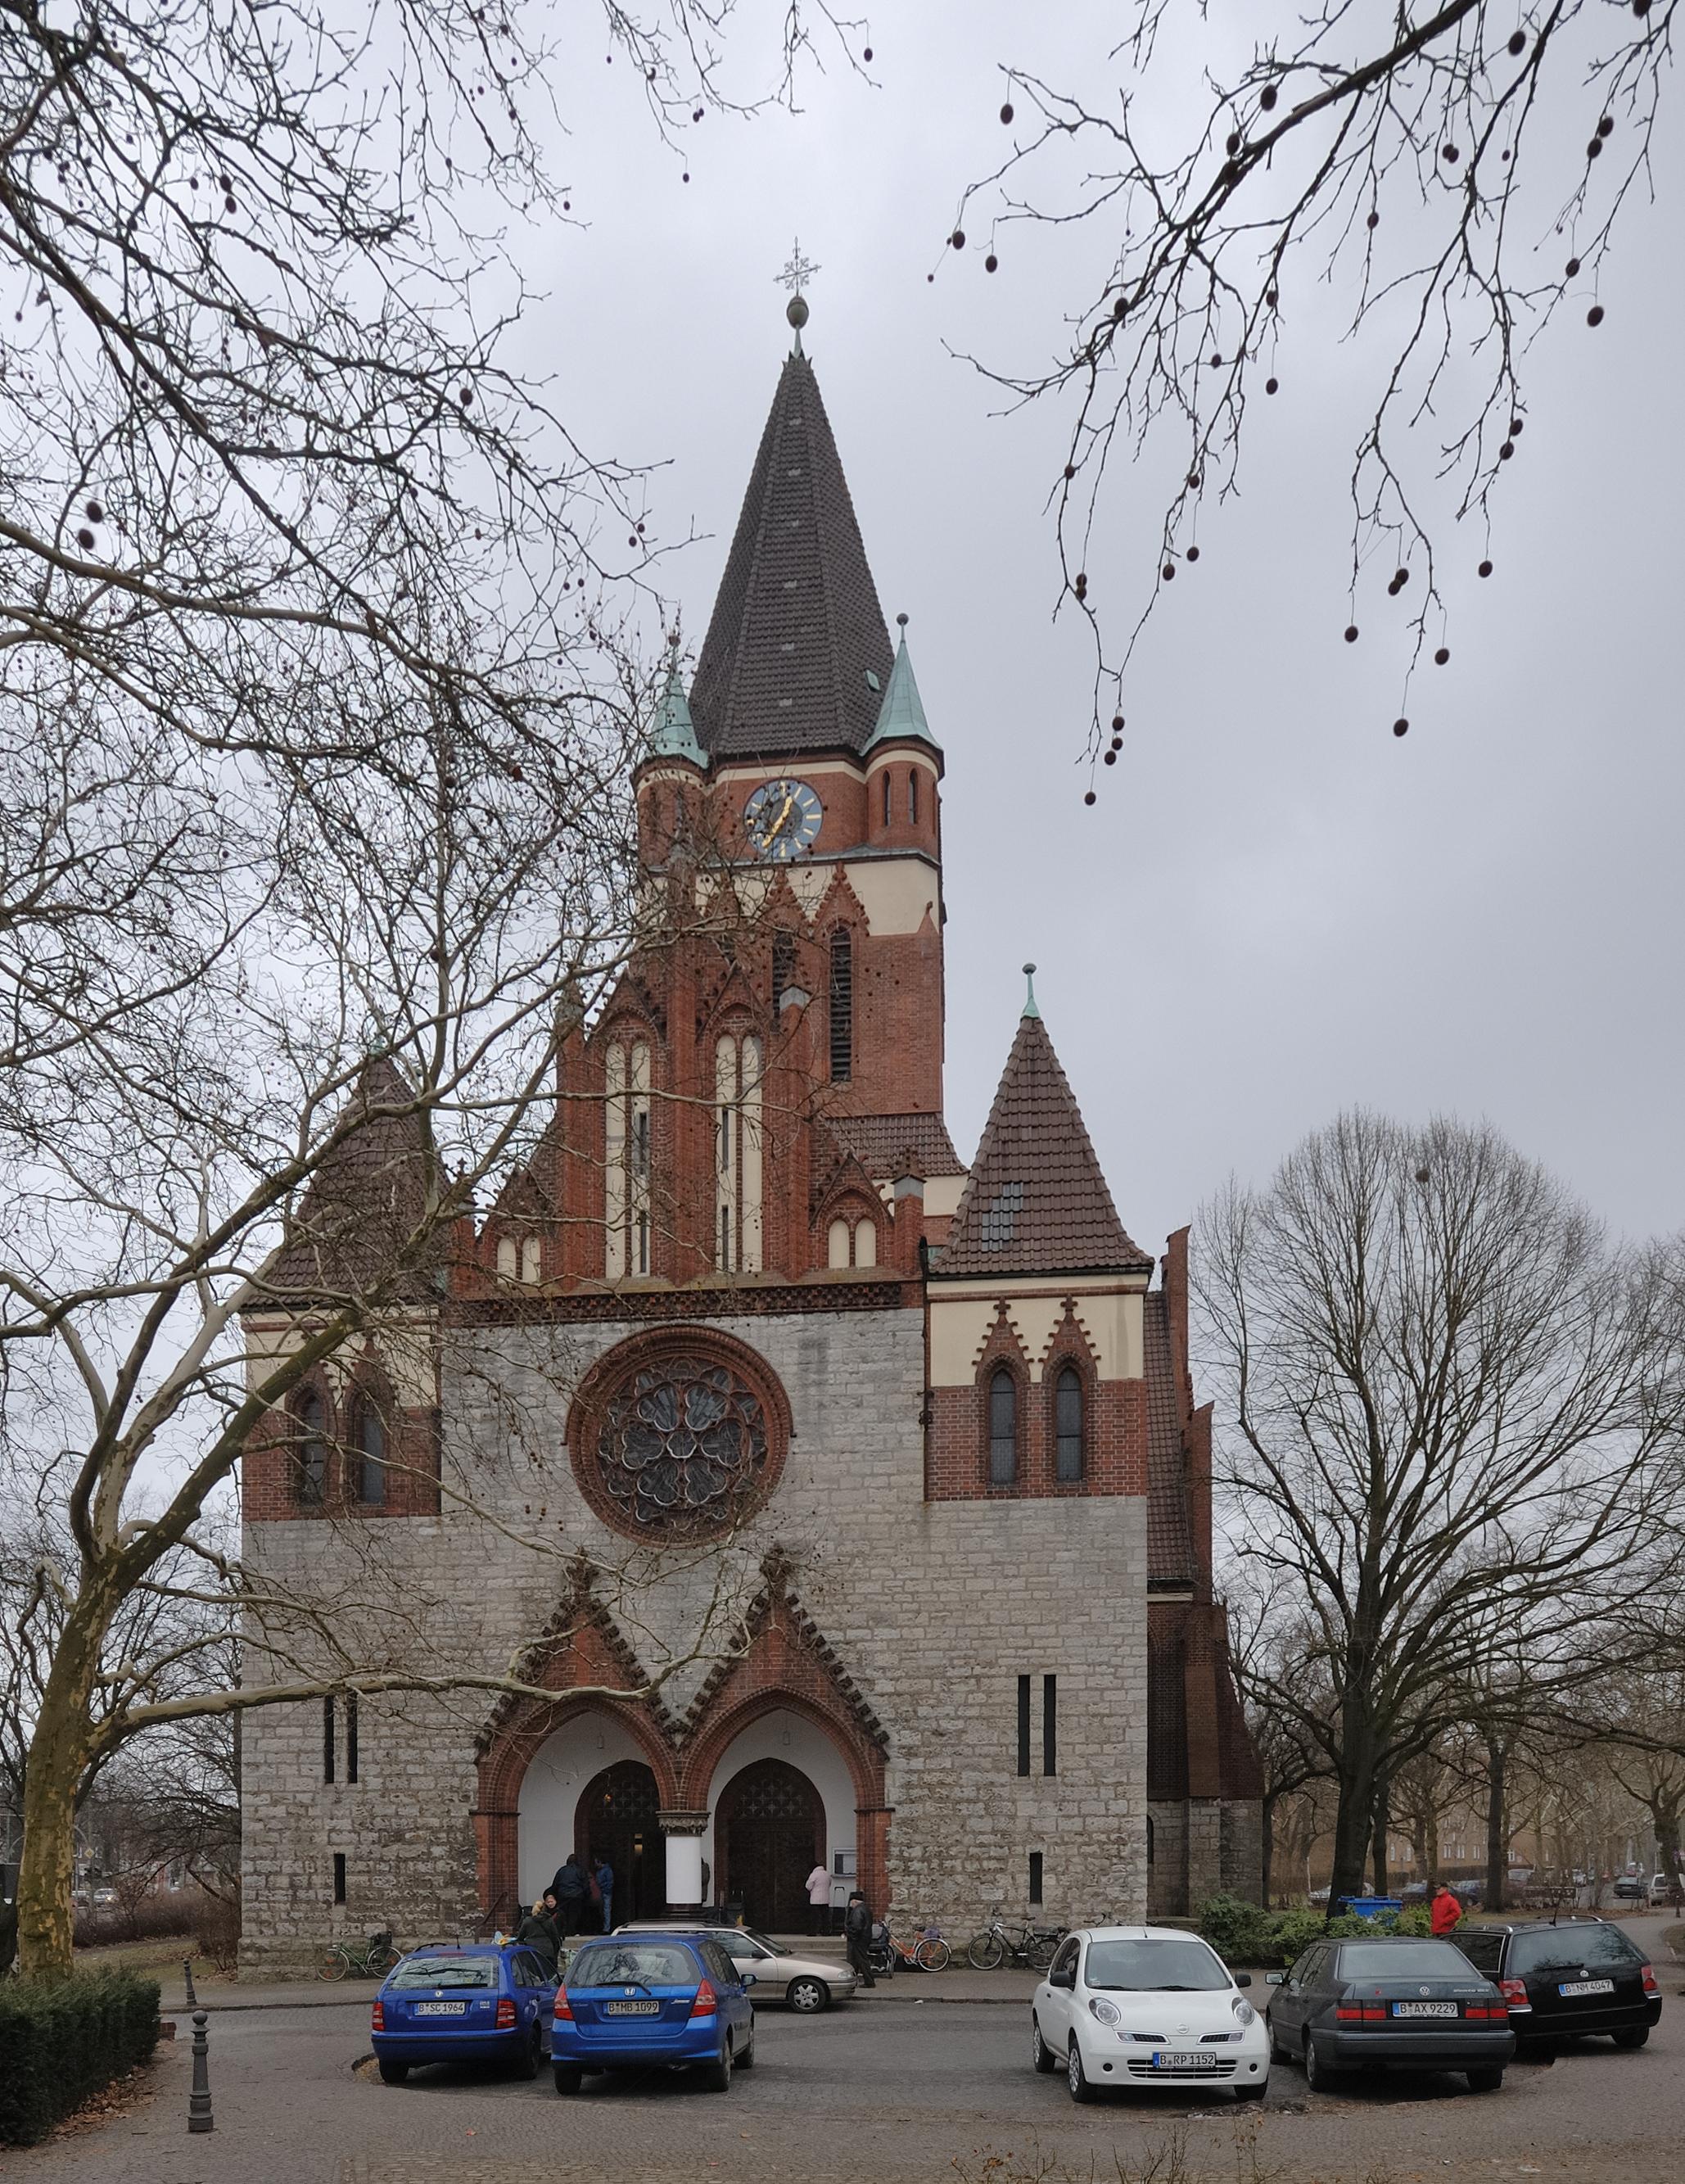 FileDreifaltigkeitskirche Berlin-Lankwitz Nordwestansicht (2010).jpg - Wikimedia Commons